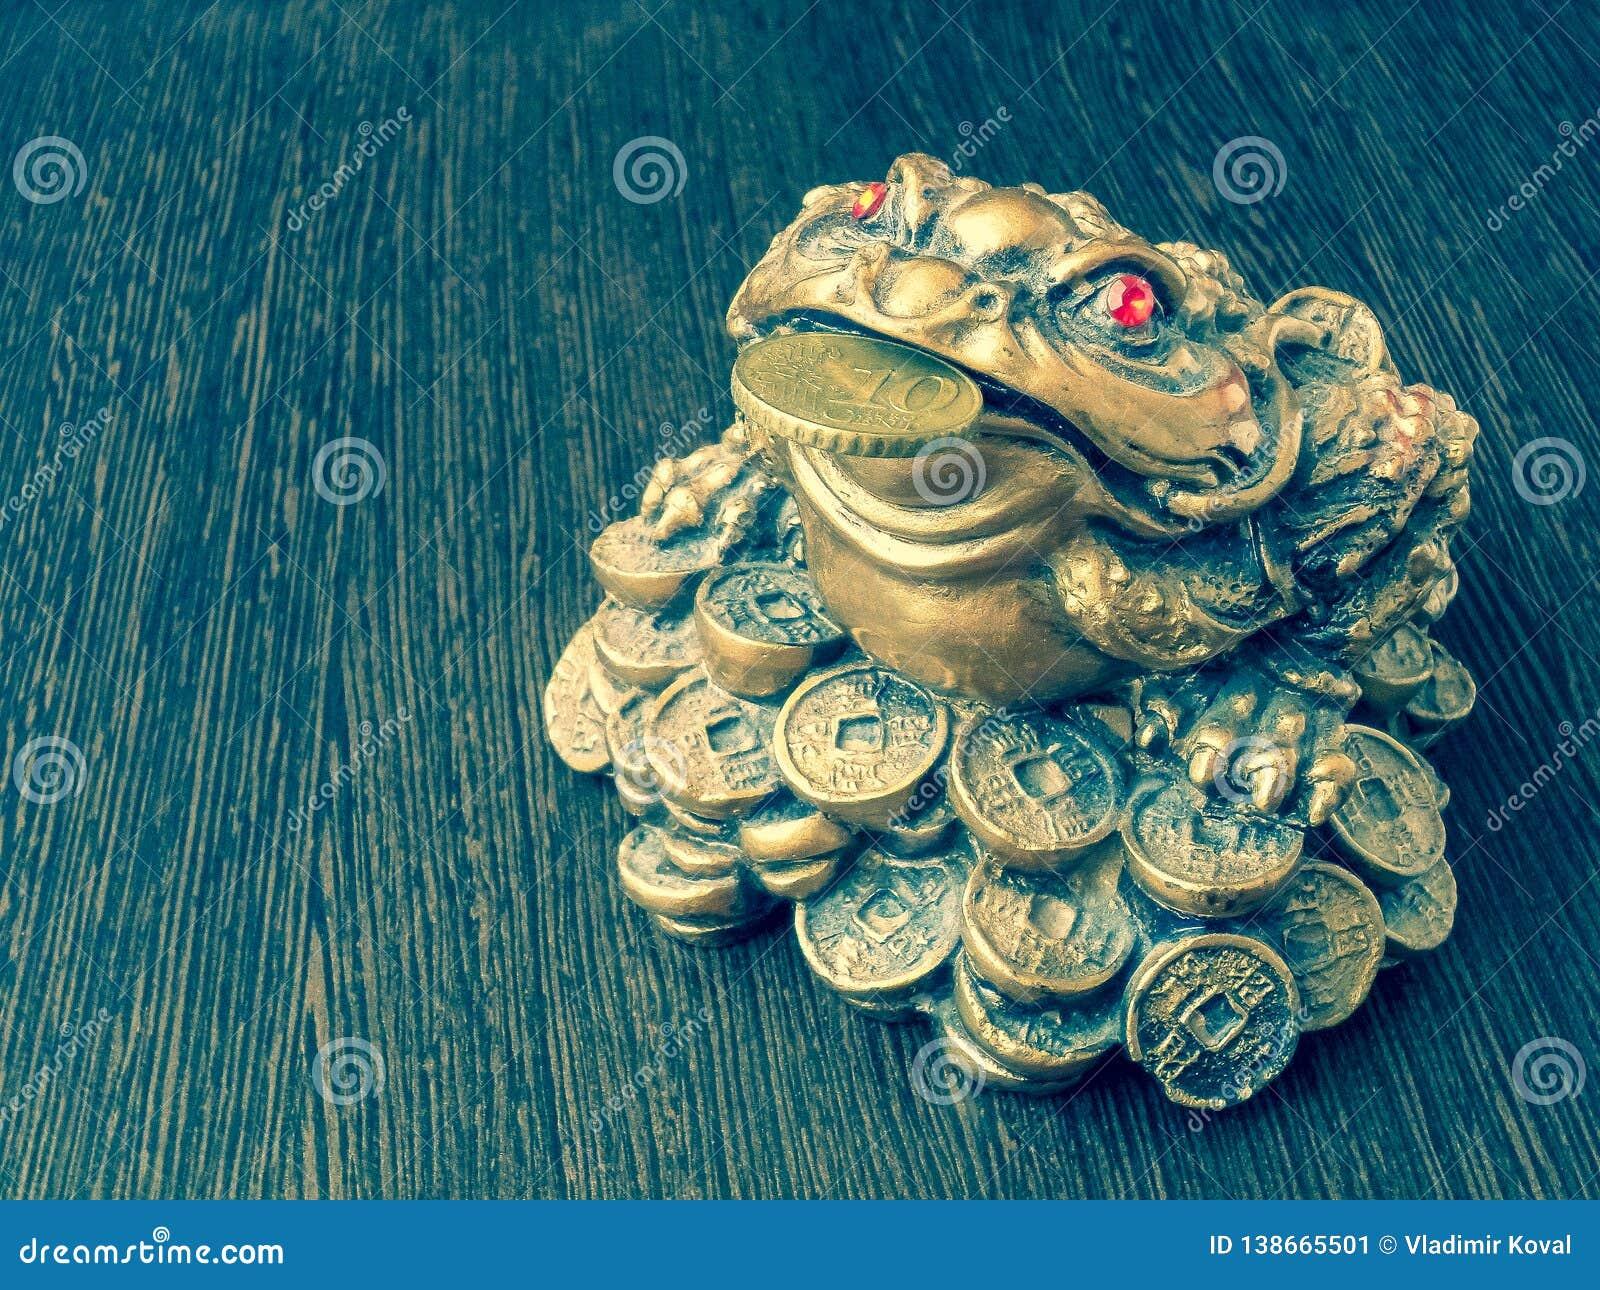 Pengargroda på en trätabell med ett mynt i dess mun